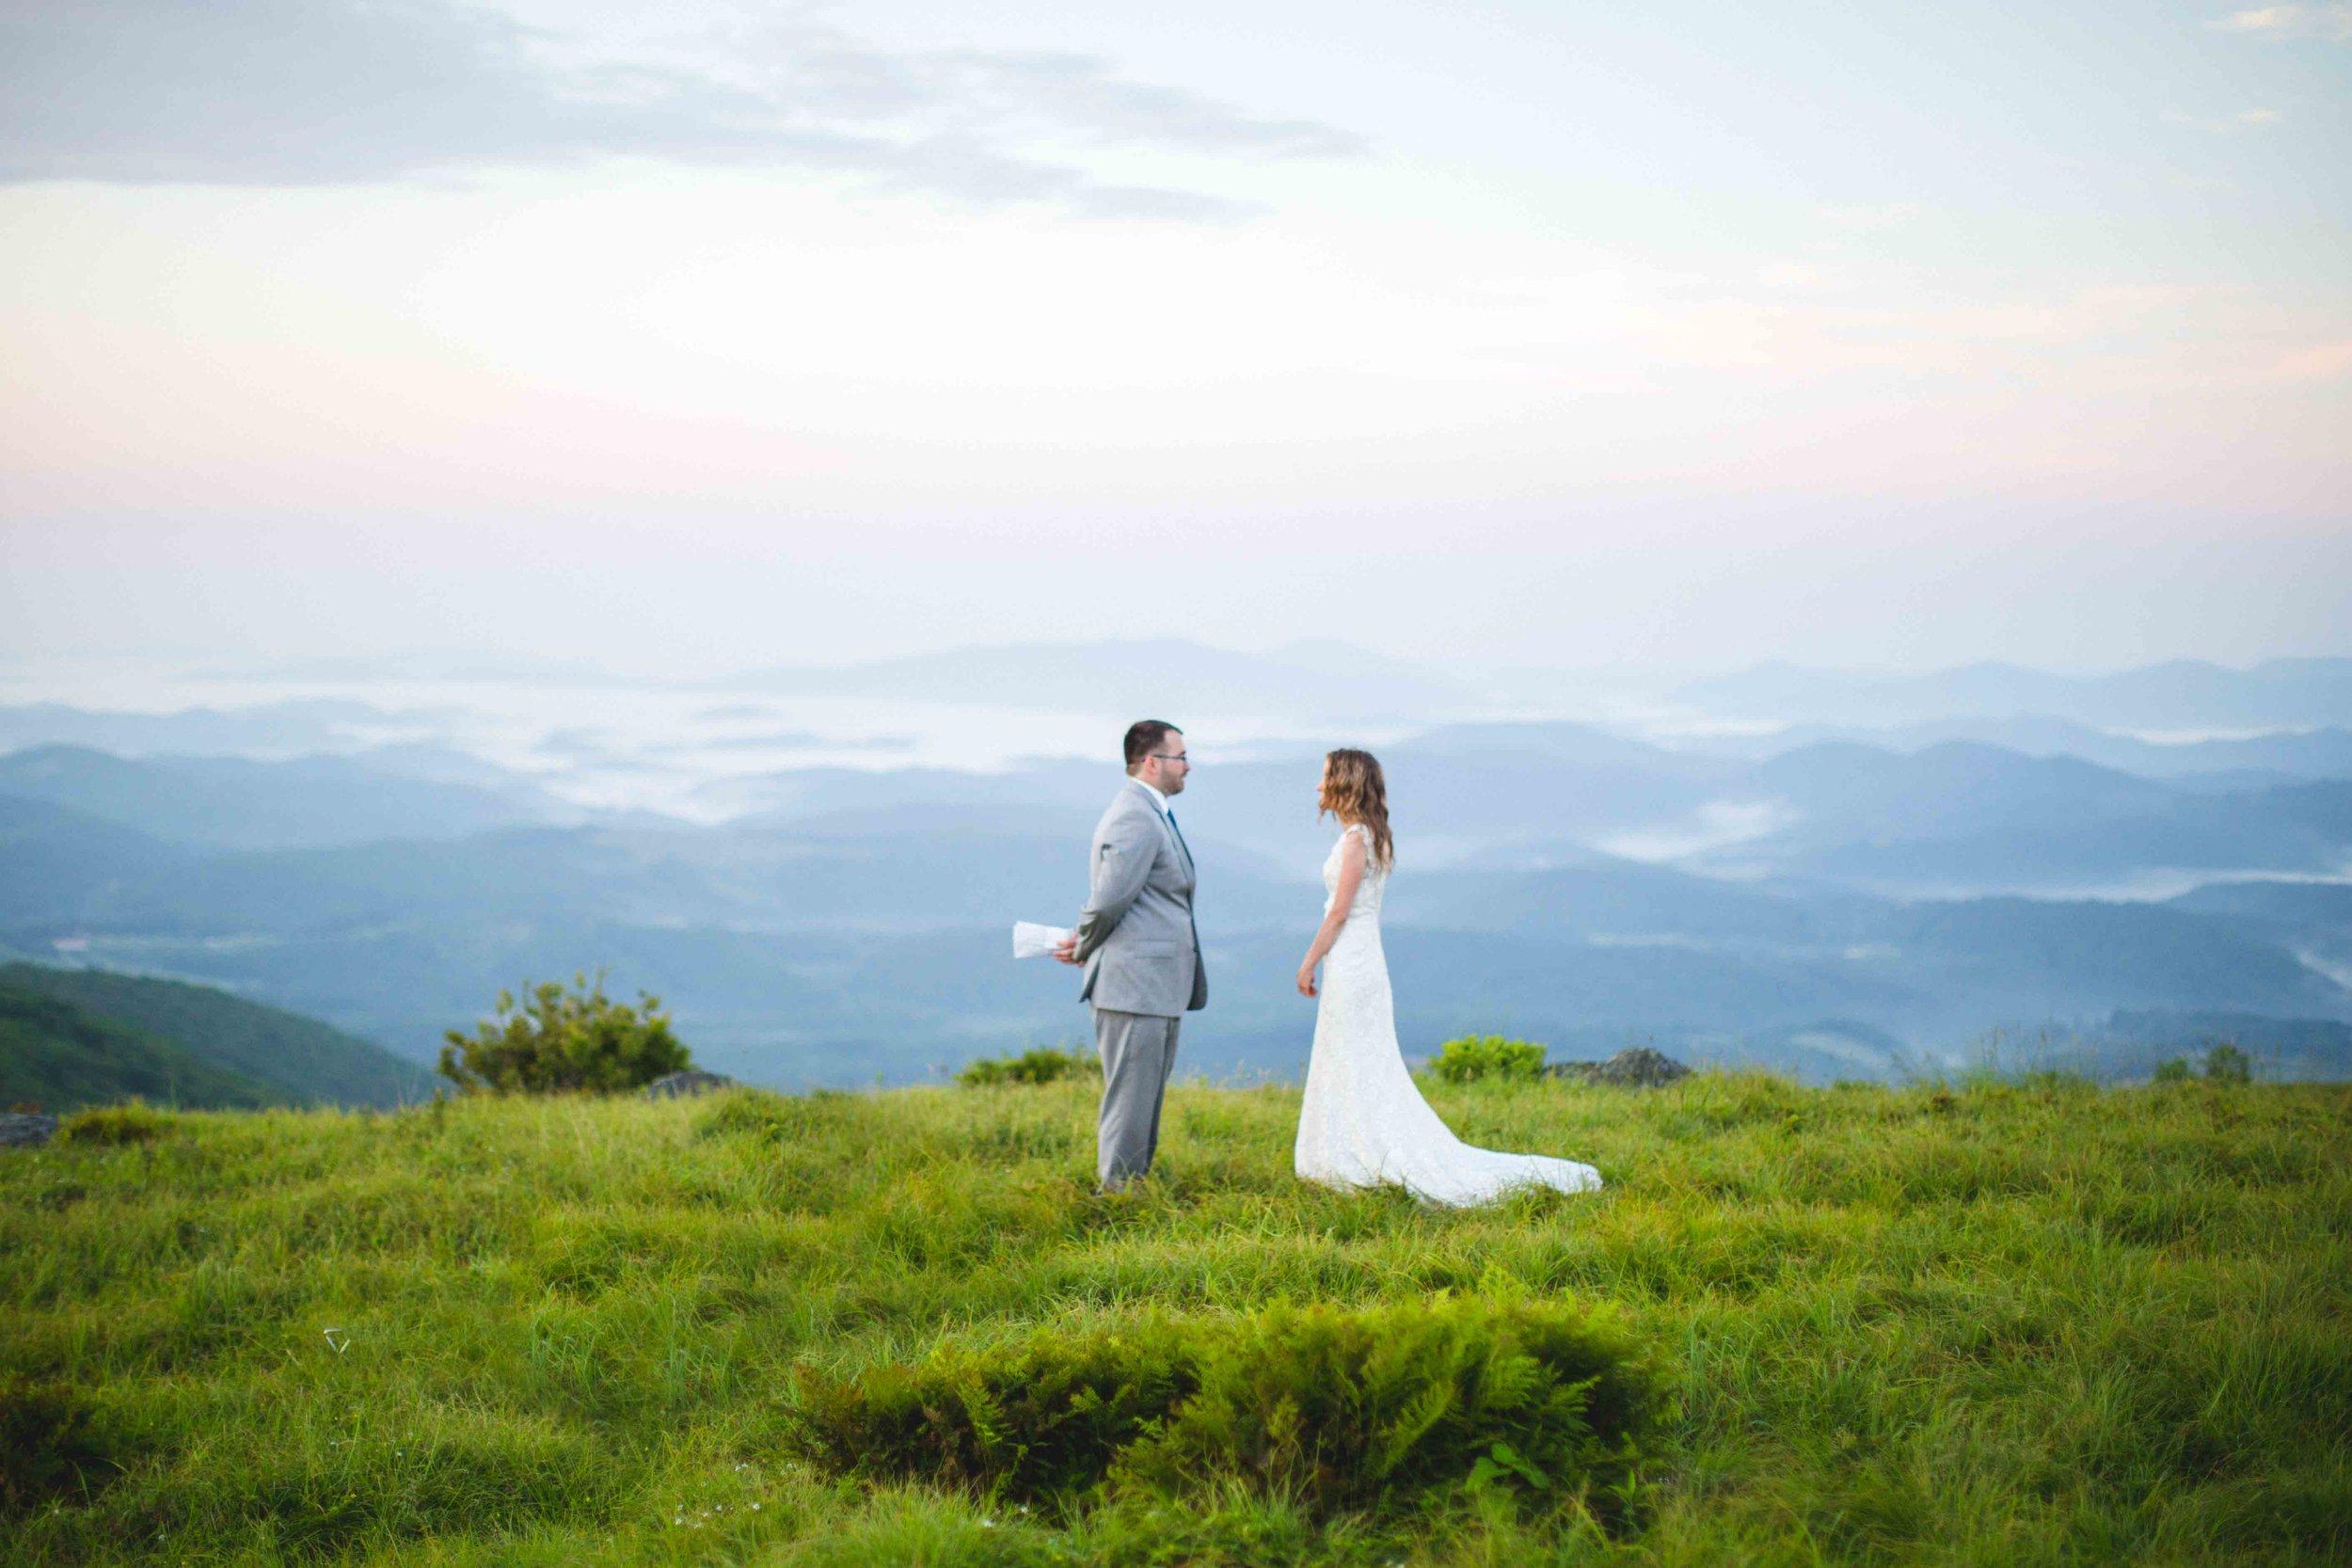 north-carolina-elopement-photographer-24.jpg